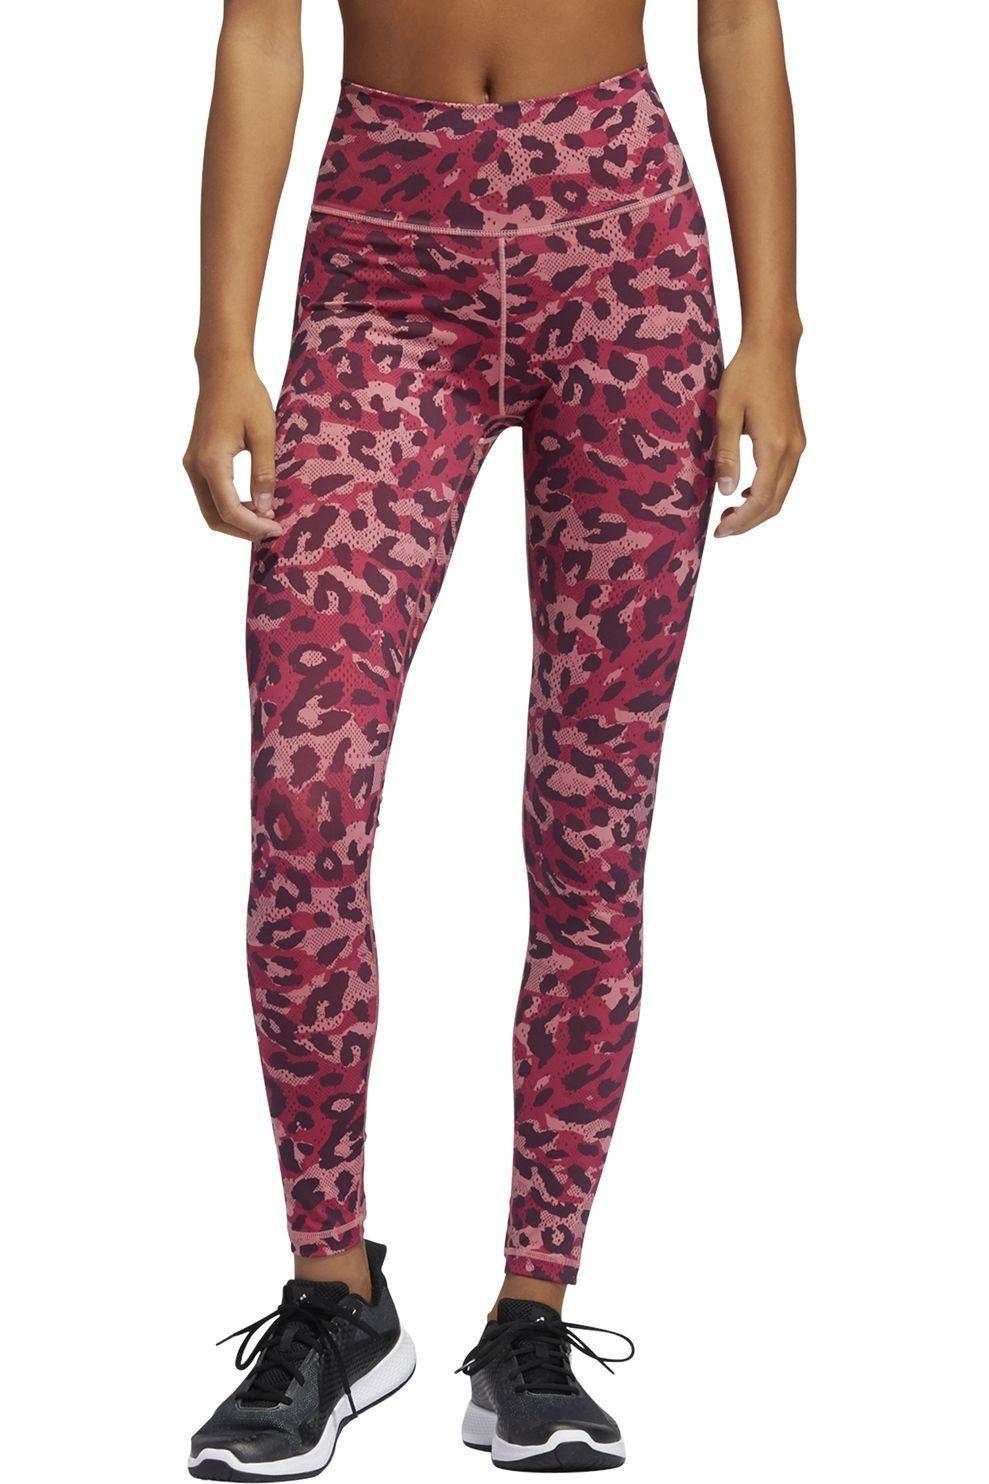 adidas Legging Bt 2.0 Aop Lt voor dames - Roze/ Gemengd - Maten: S, M, L, XL